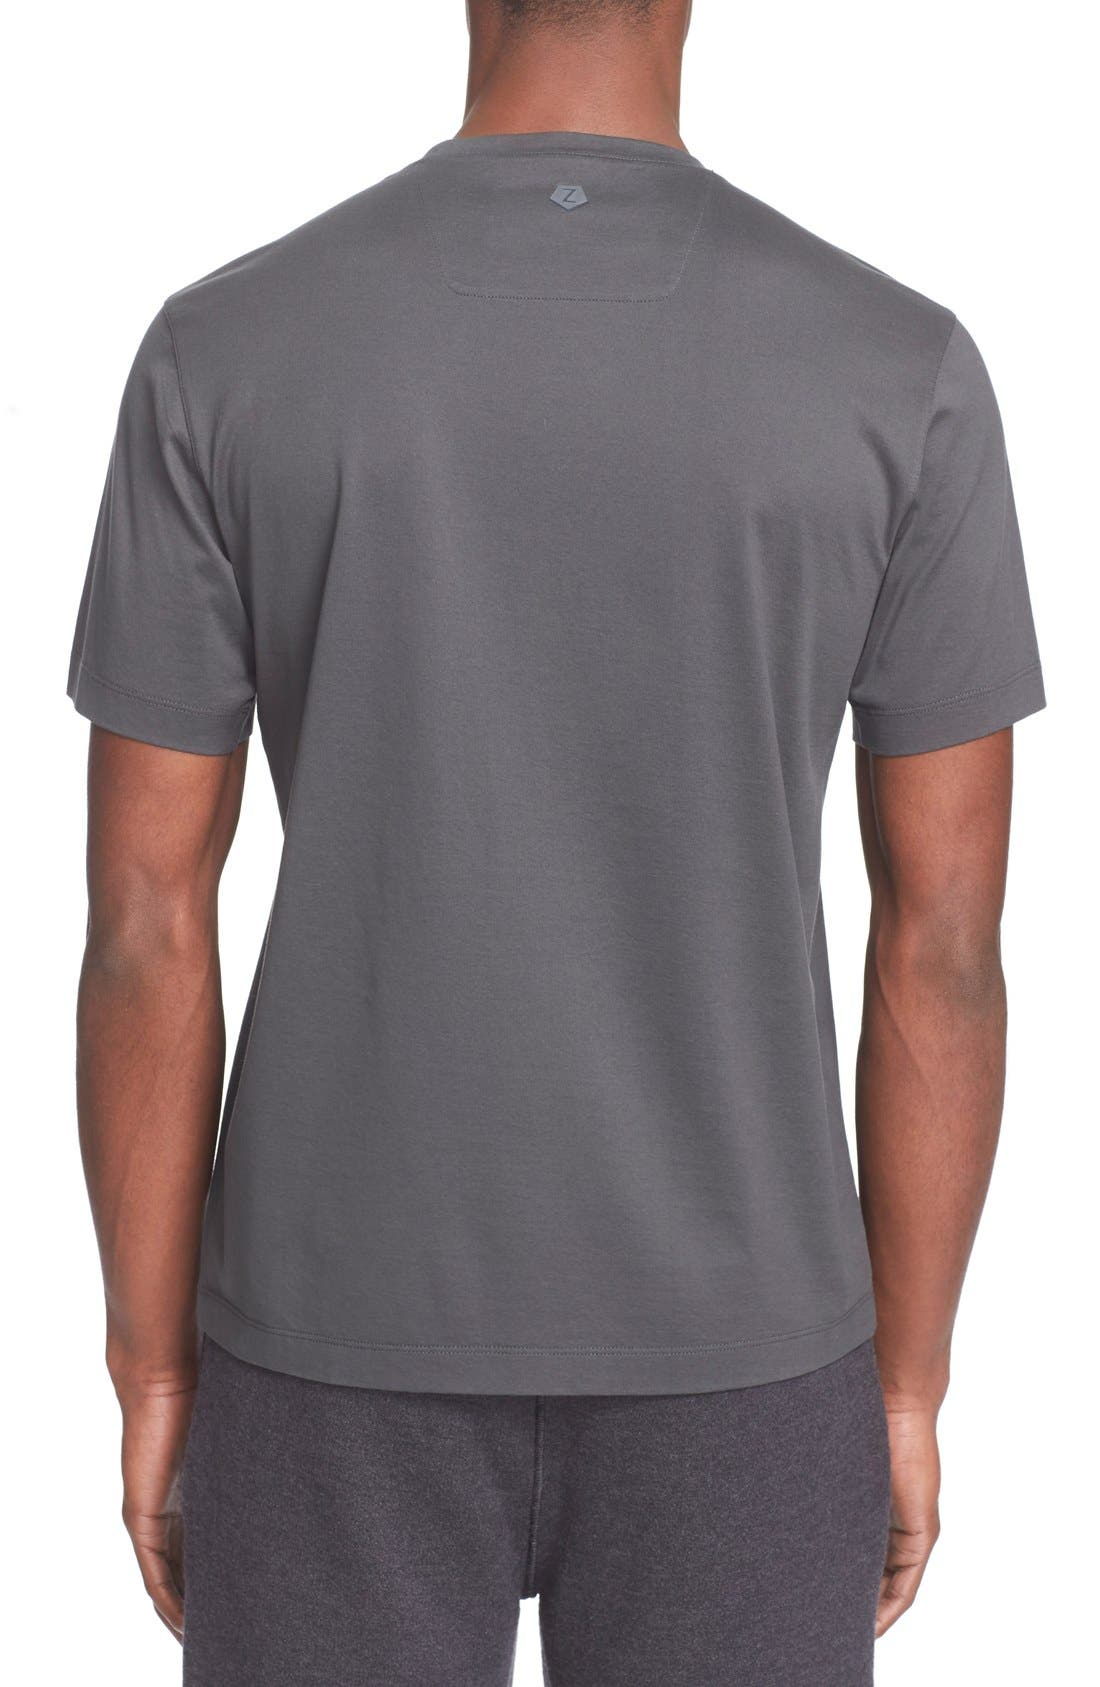 Alternate Image 2  - Z Zegna Flocked Graphic T-Shirt